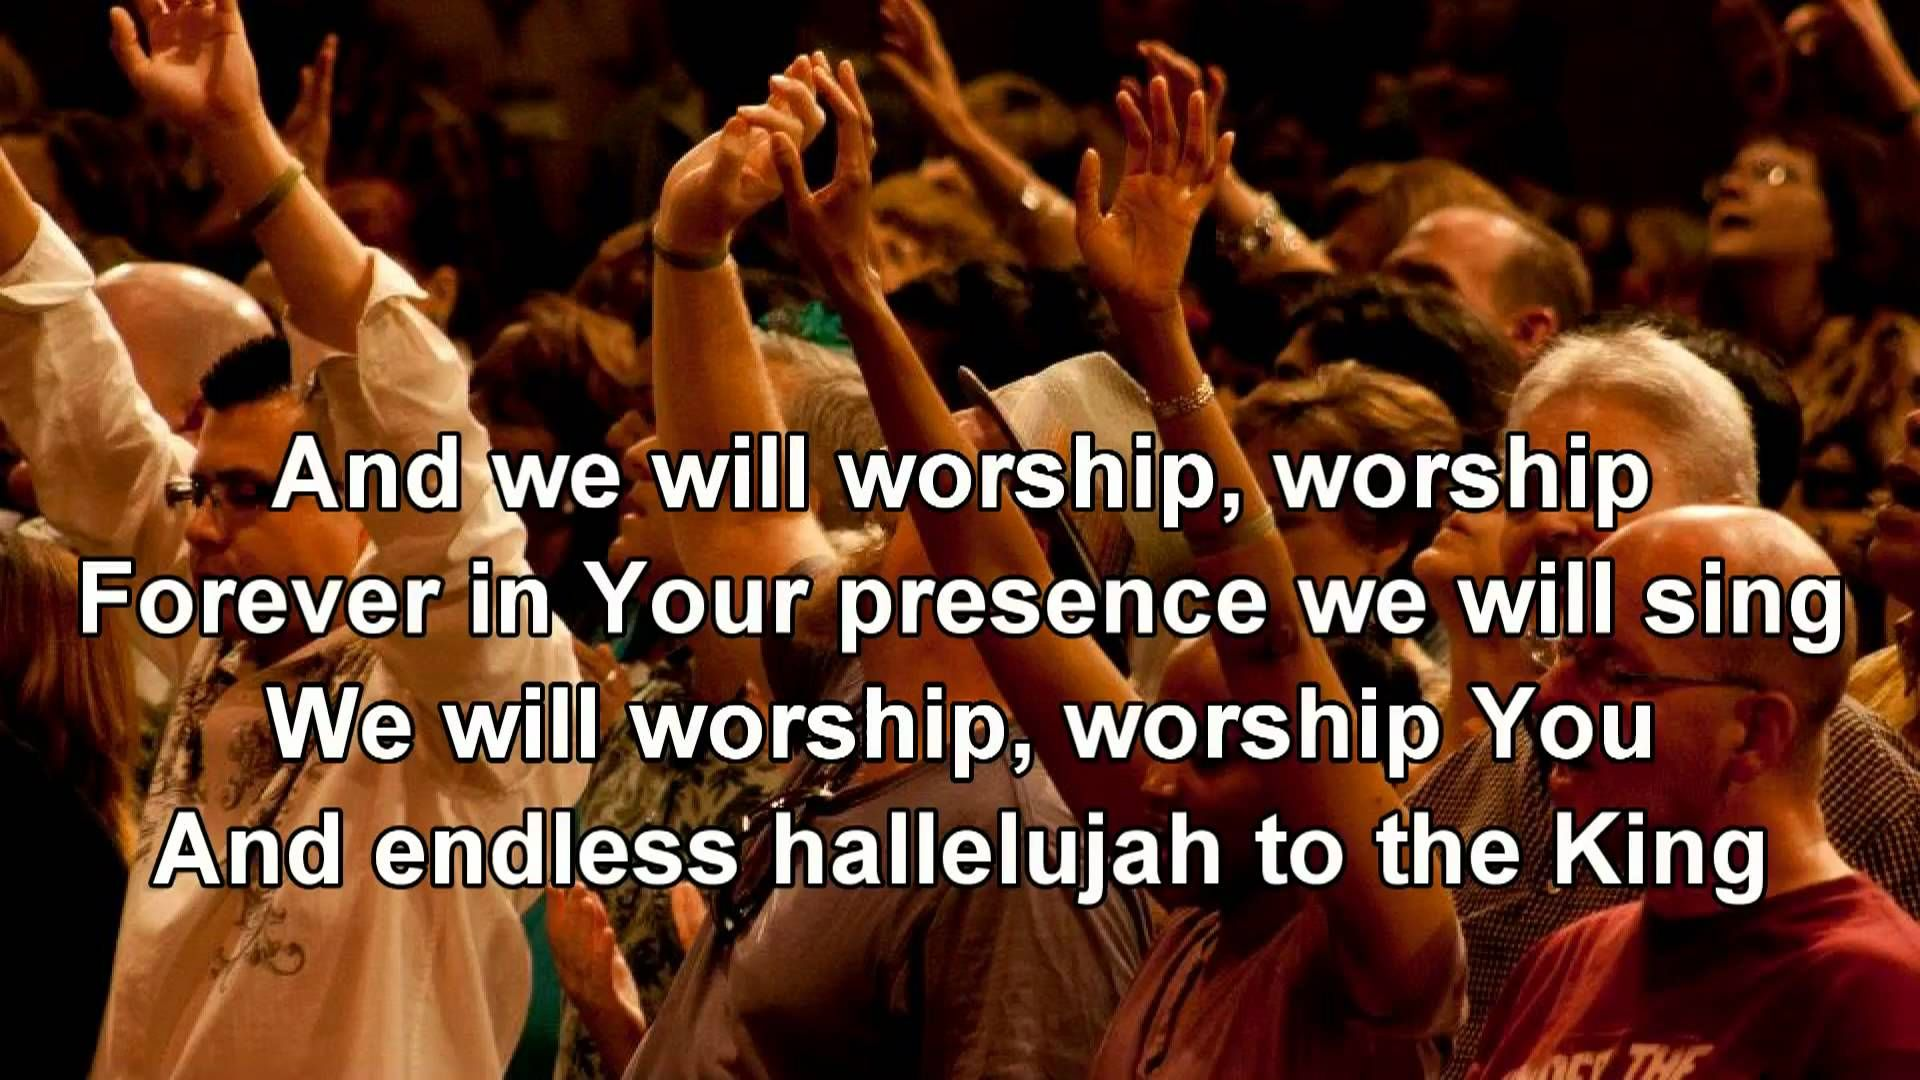 Endless Hallelujah - Matt Redman (Worship with Lyrics), via YouTube